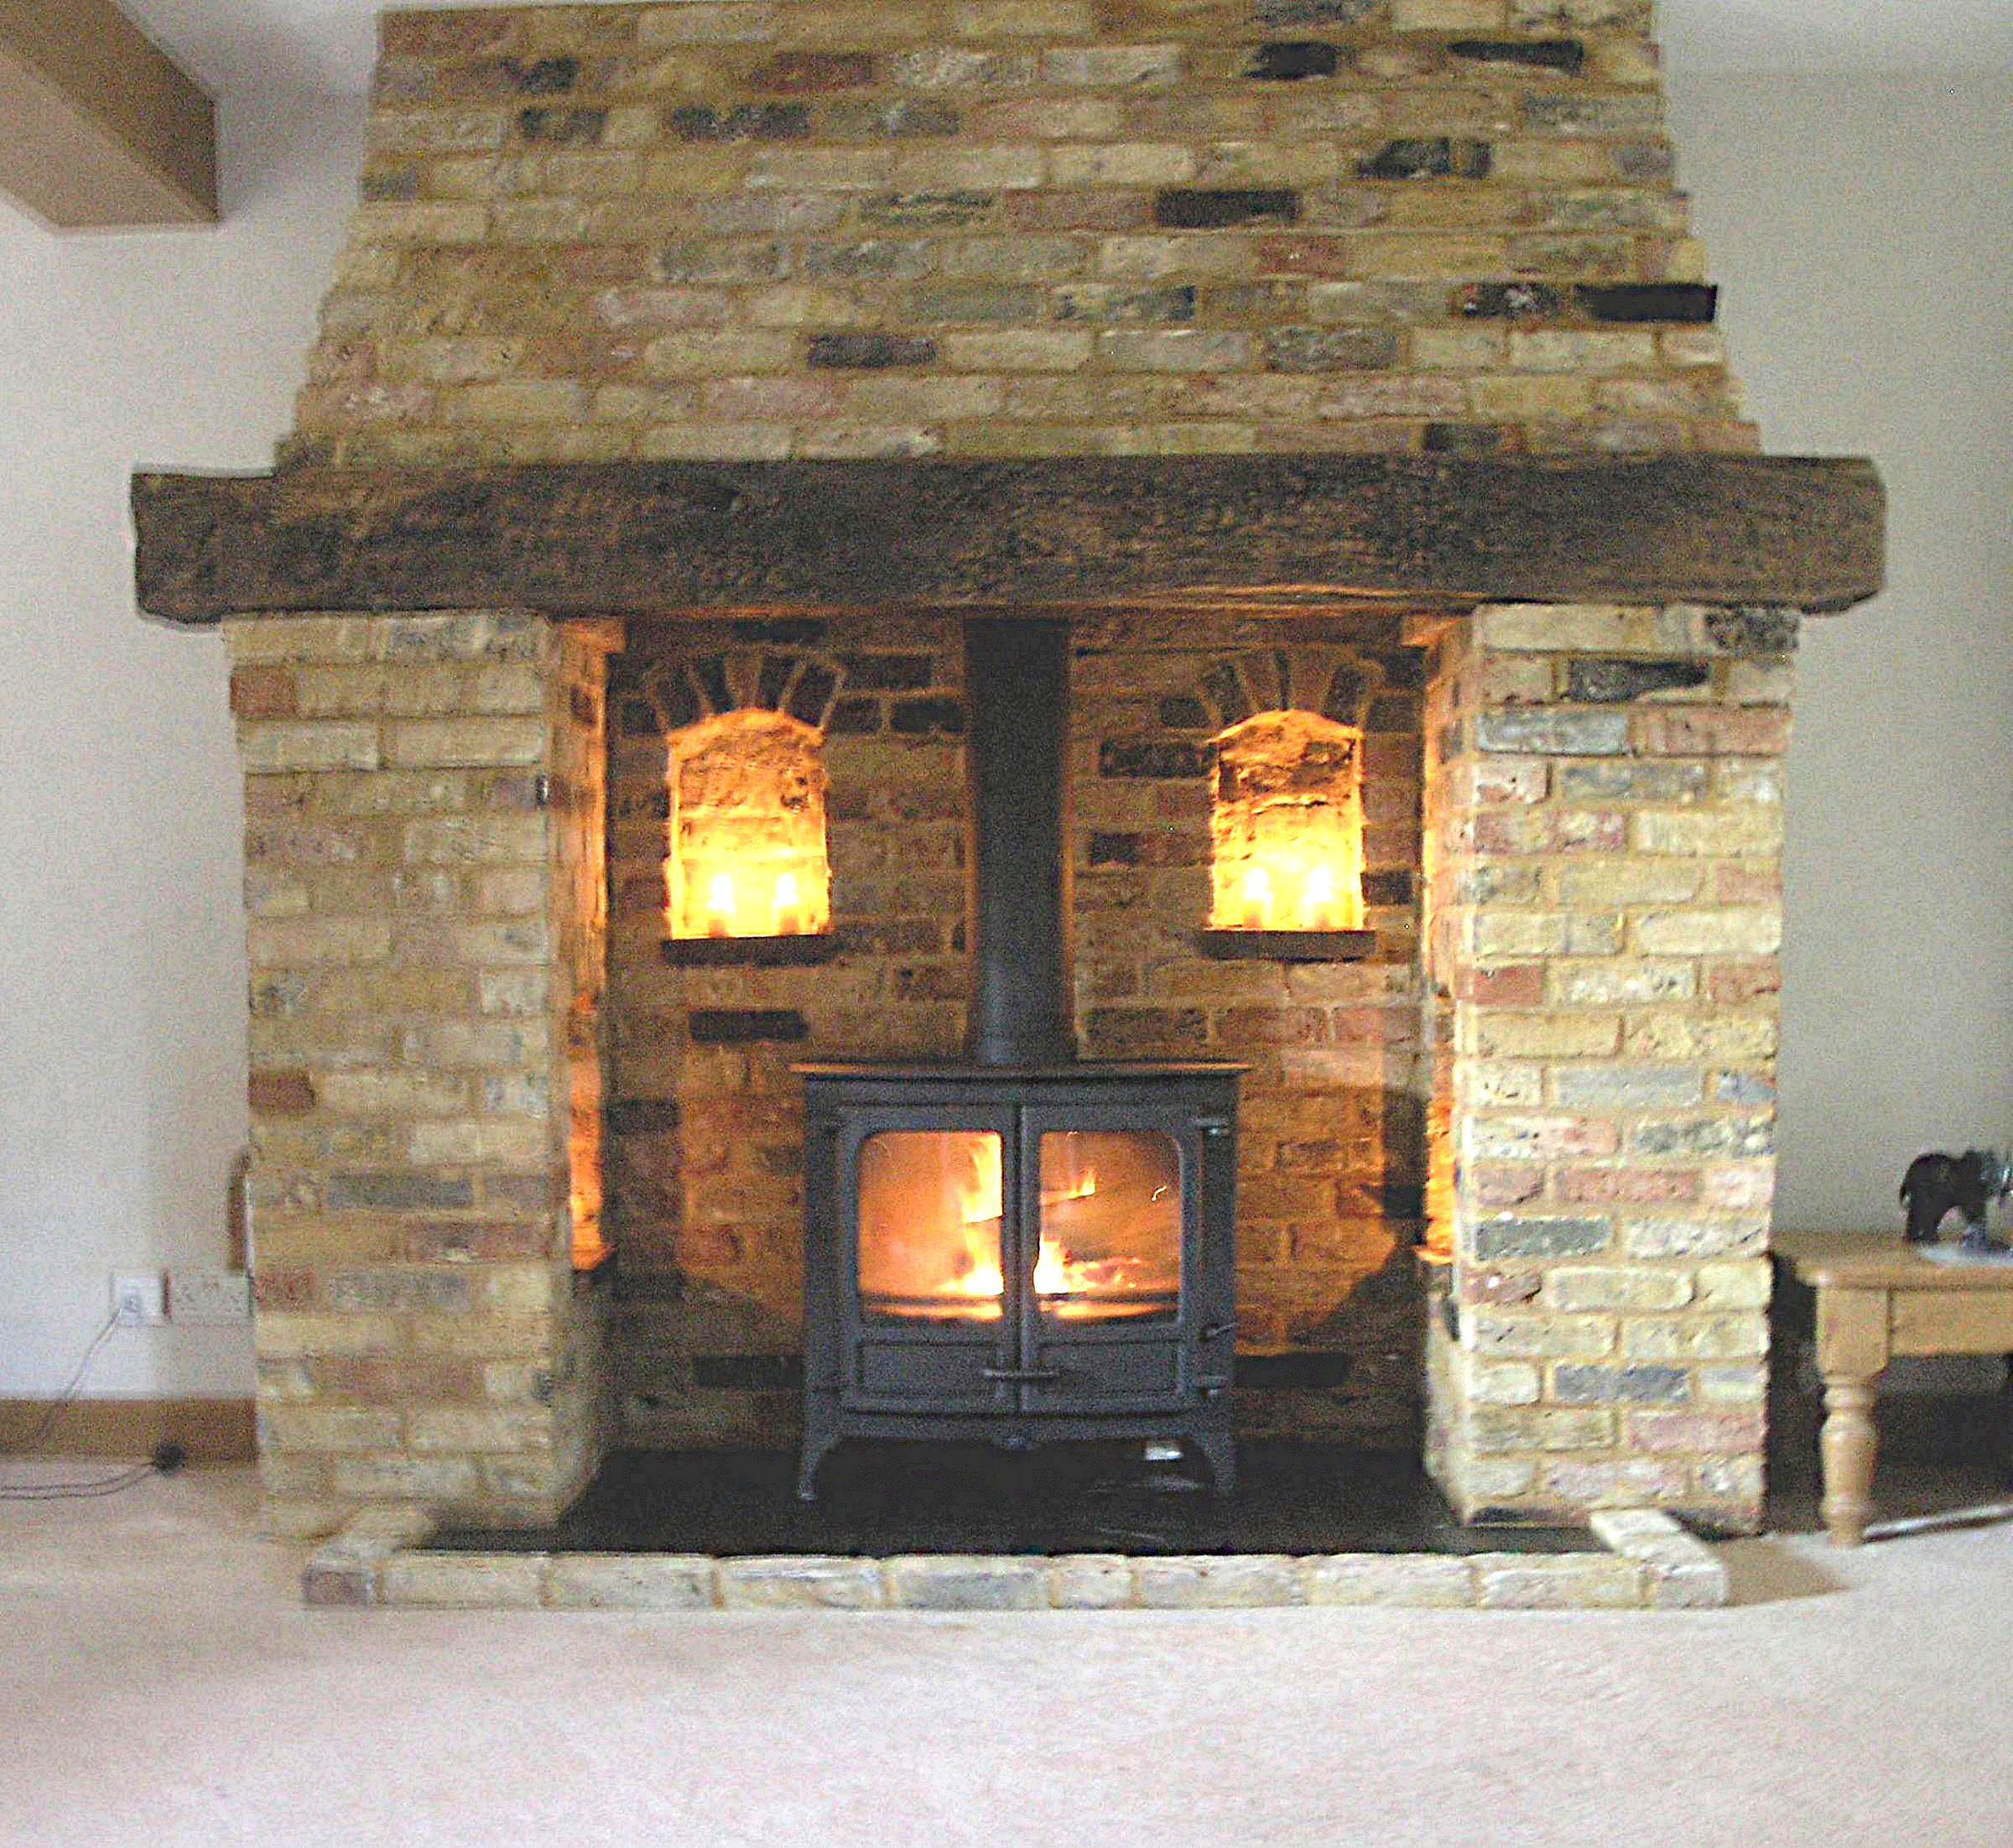 bespoke reclaimed brick and oak inglenook fireplace with a